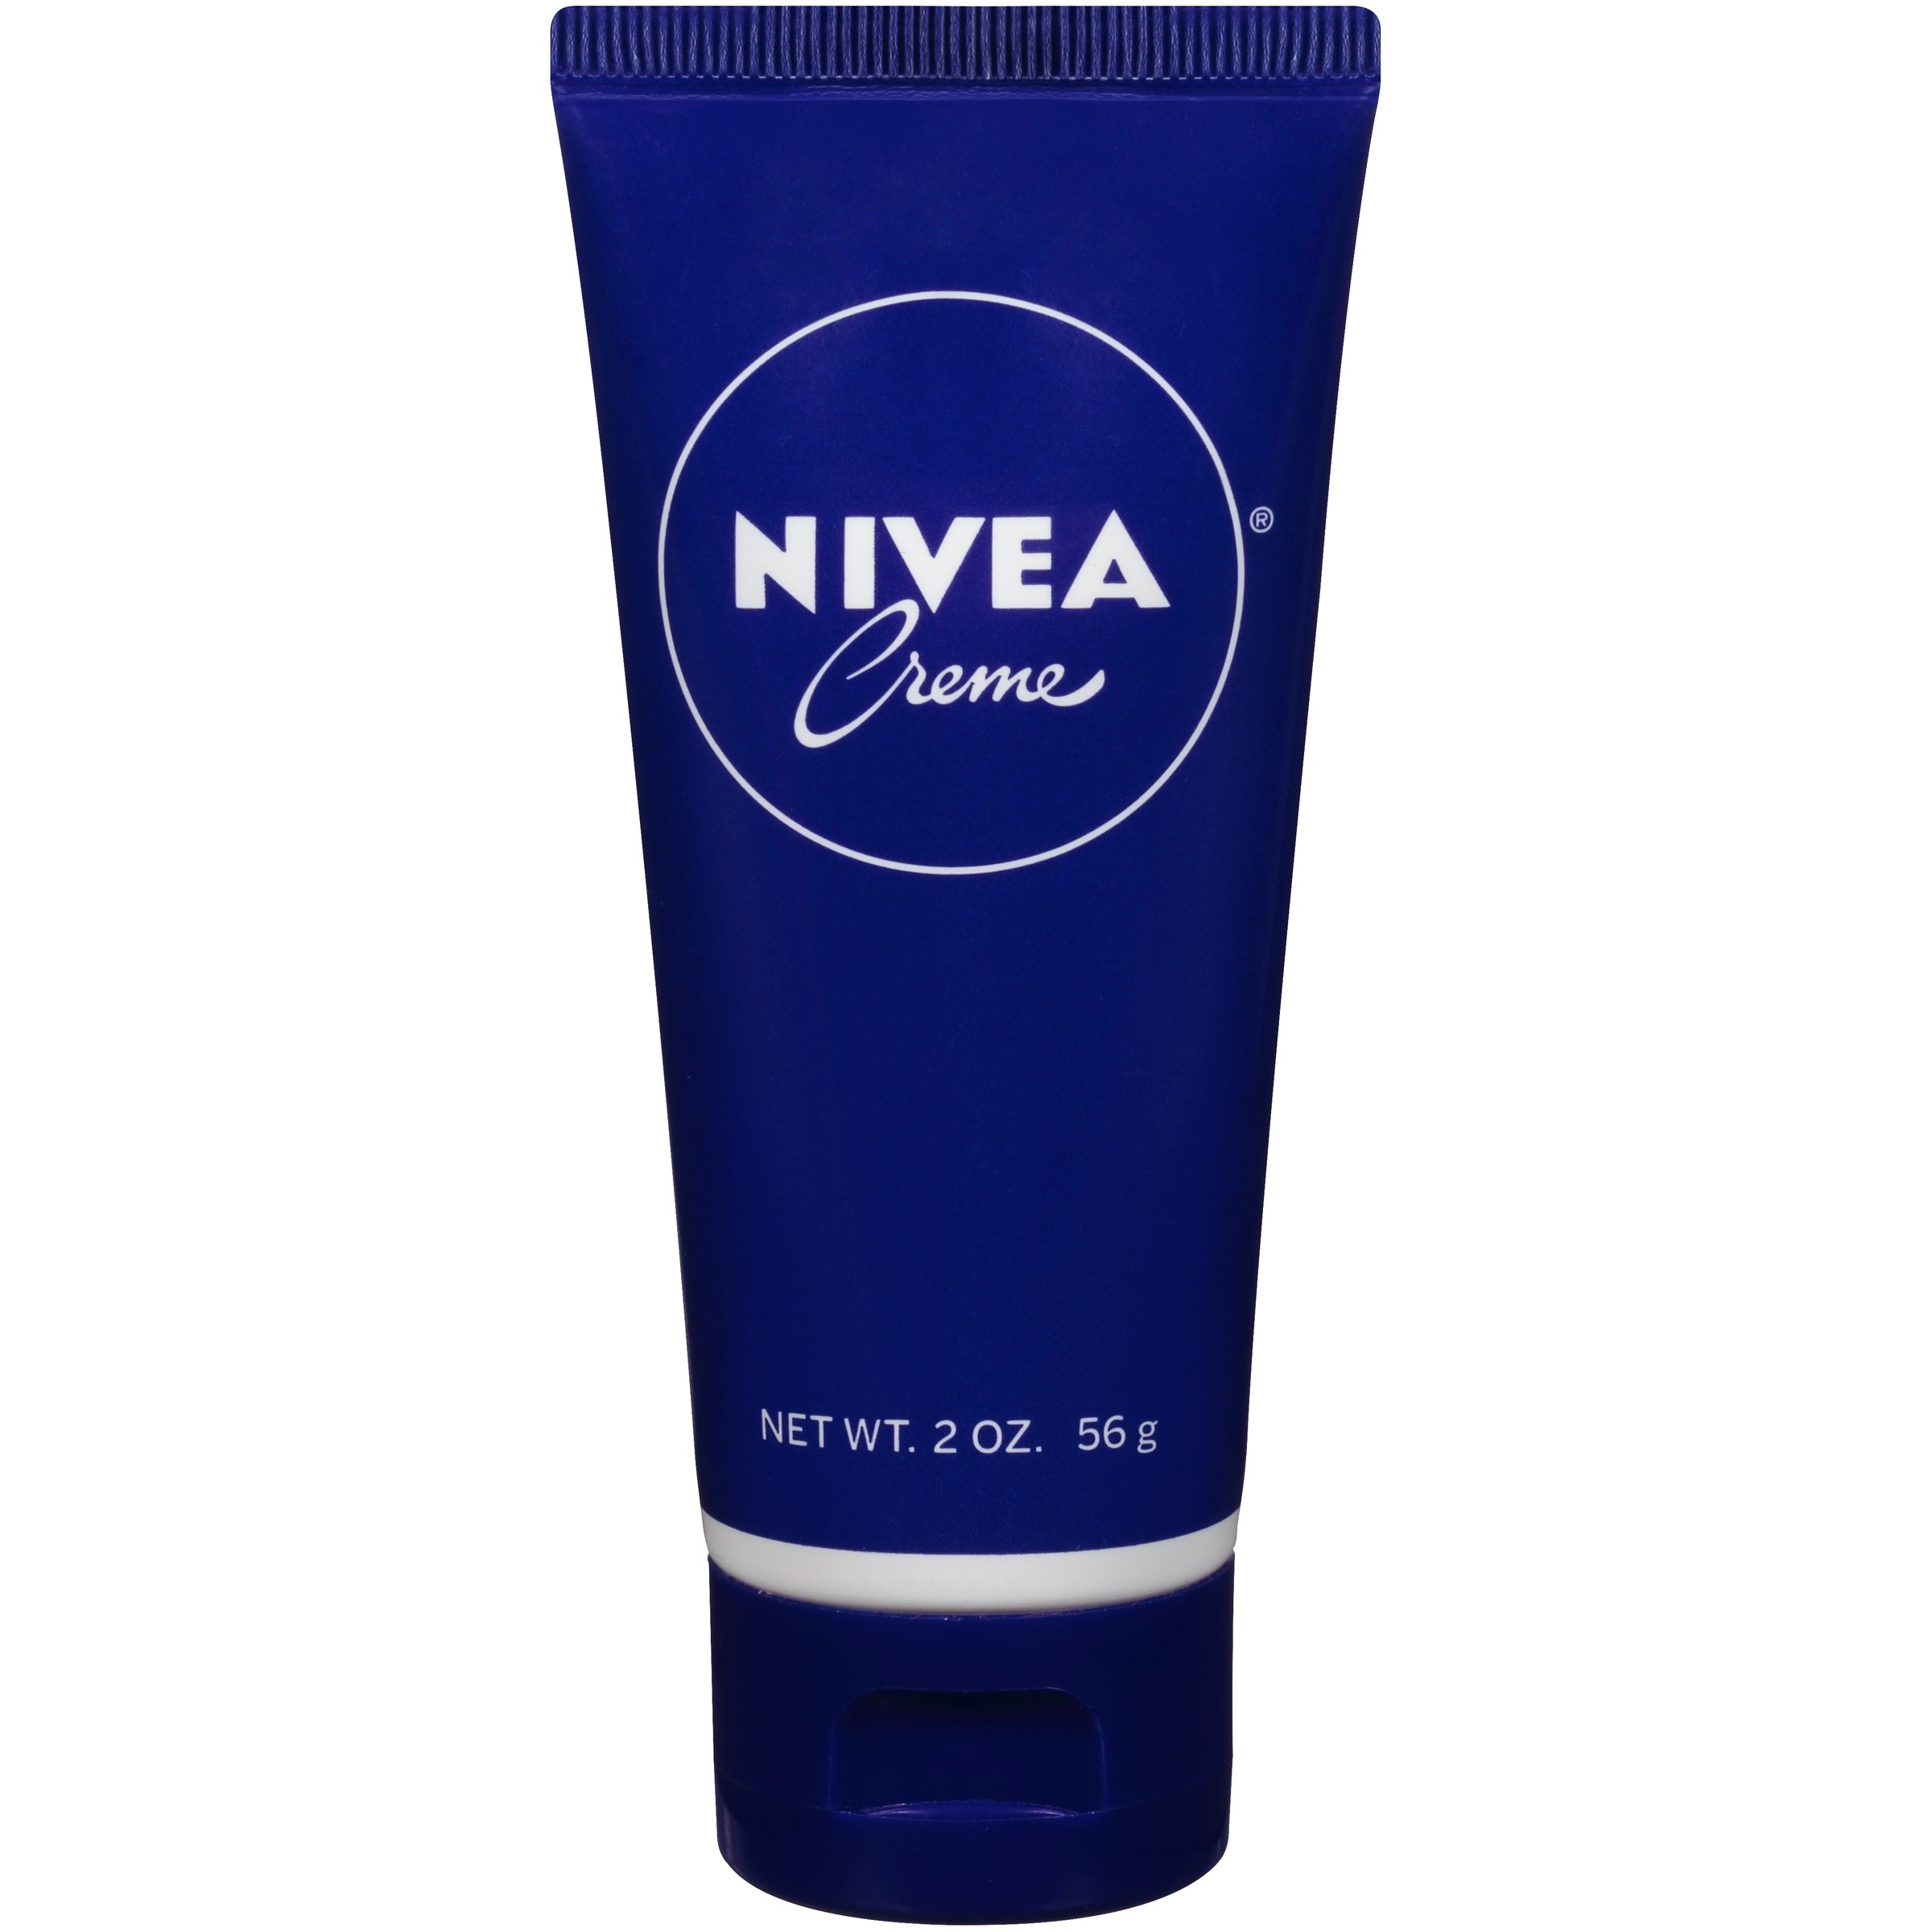 Nivea Luxury Collection 5 Piece Gift Set by Nivea (Image #7)